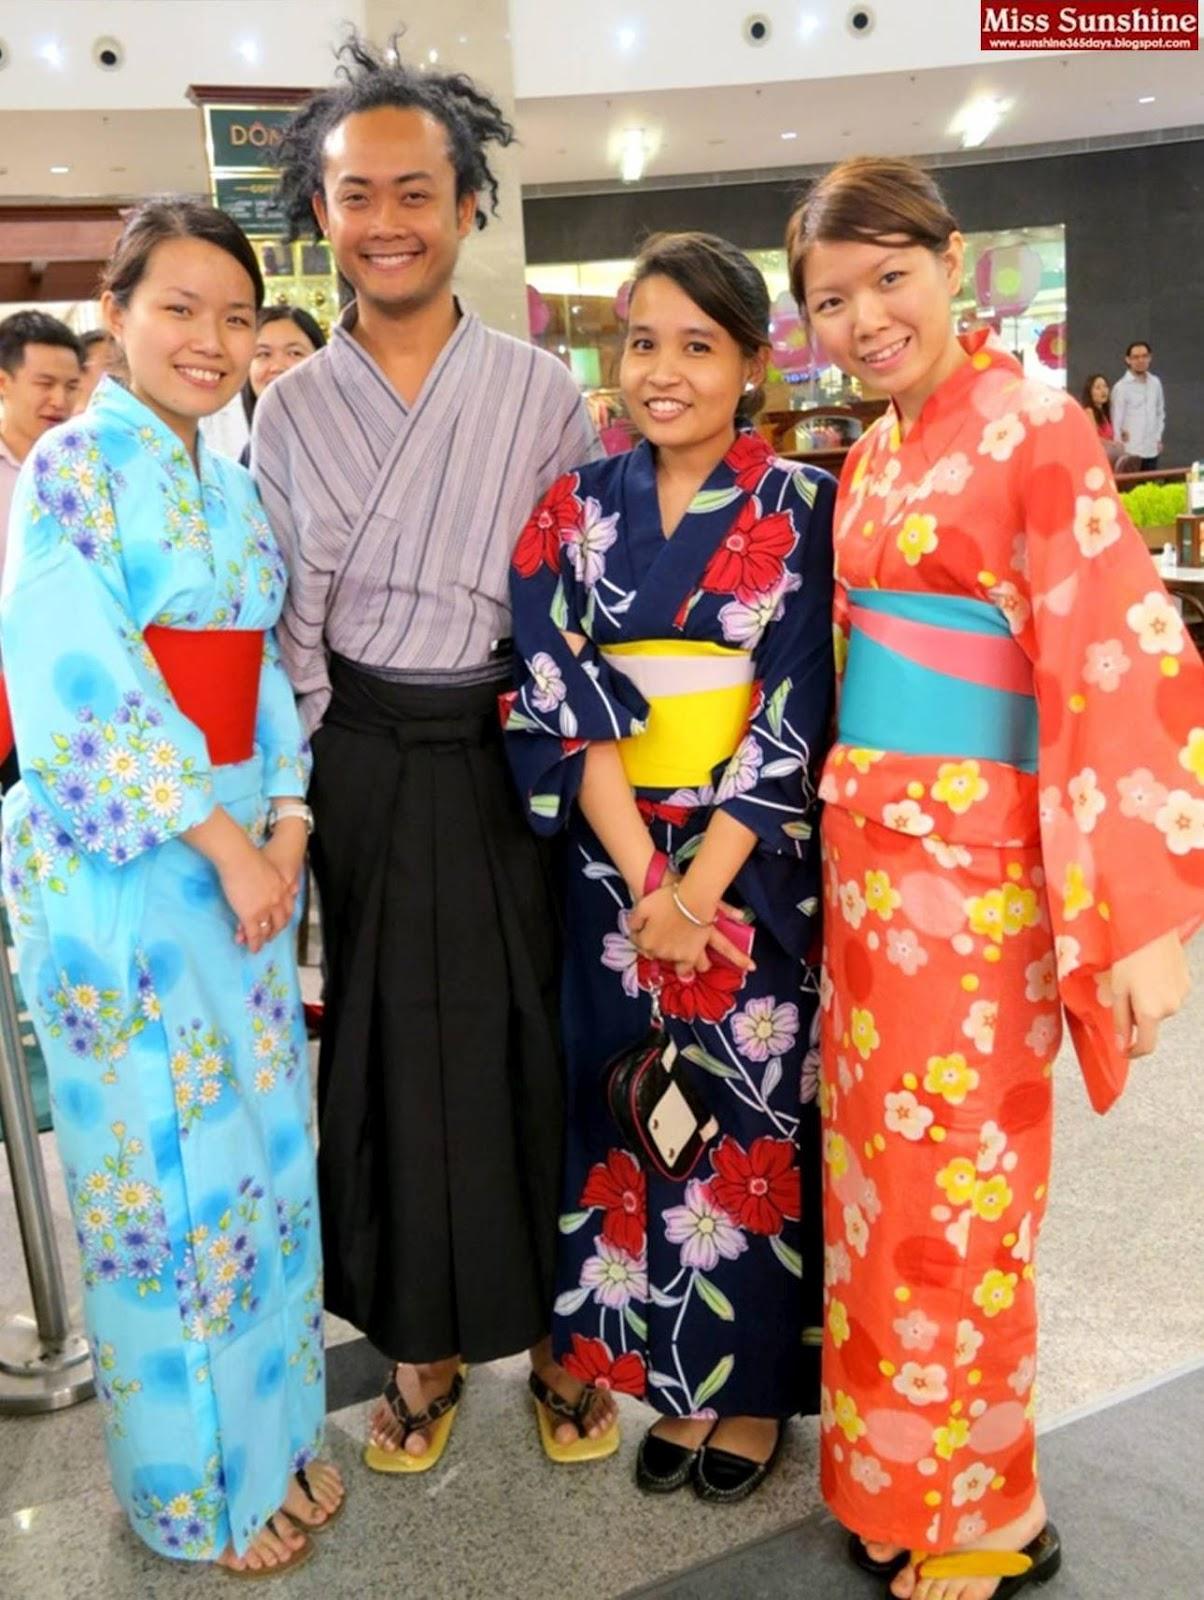 http://1.bp.blogspot.com/-E5GhHSQmZBg/UBBdRs0Y16I/AAAAAAAALLg/wocjt4phSQw/s1600/Tokyo+Street+Anni+5.jpg